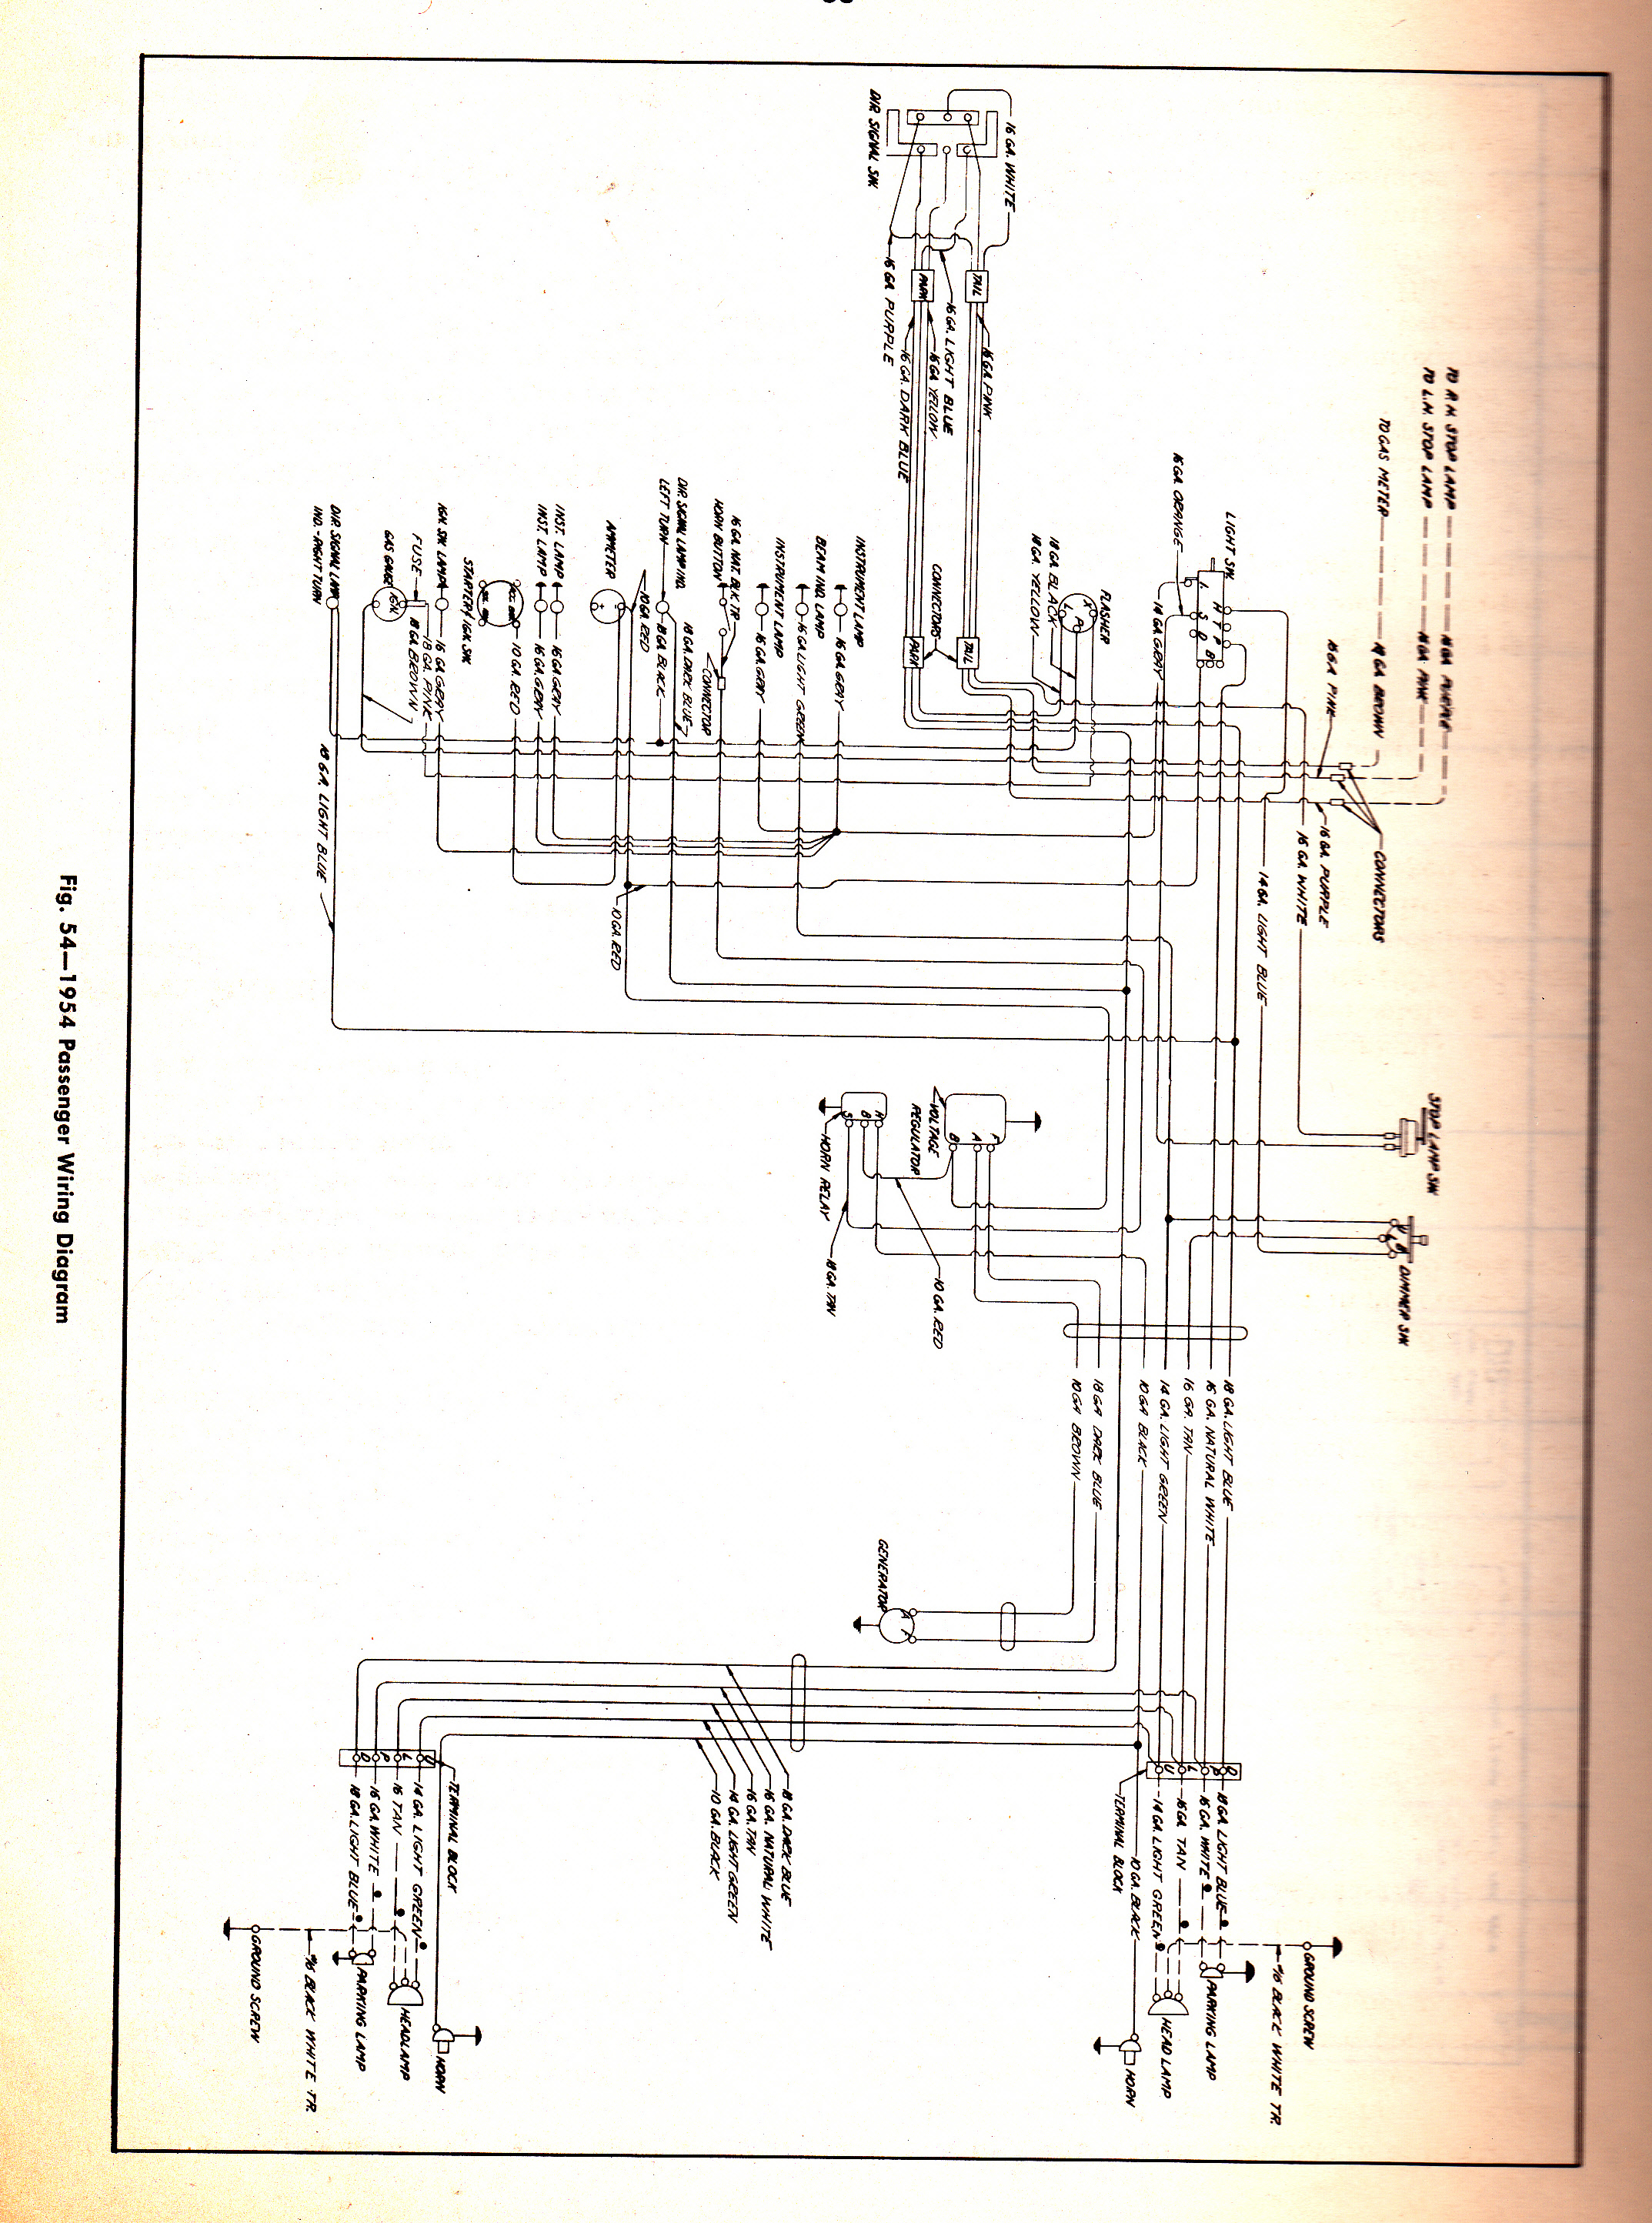 1949 1951 ford dash wiring diagram 1951 chevy fleetline wiring diagram #12